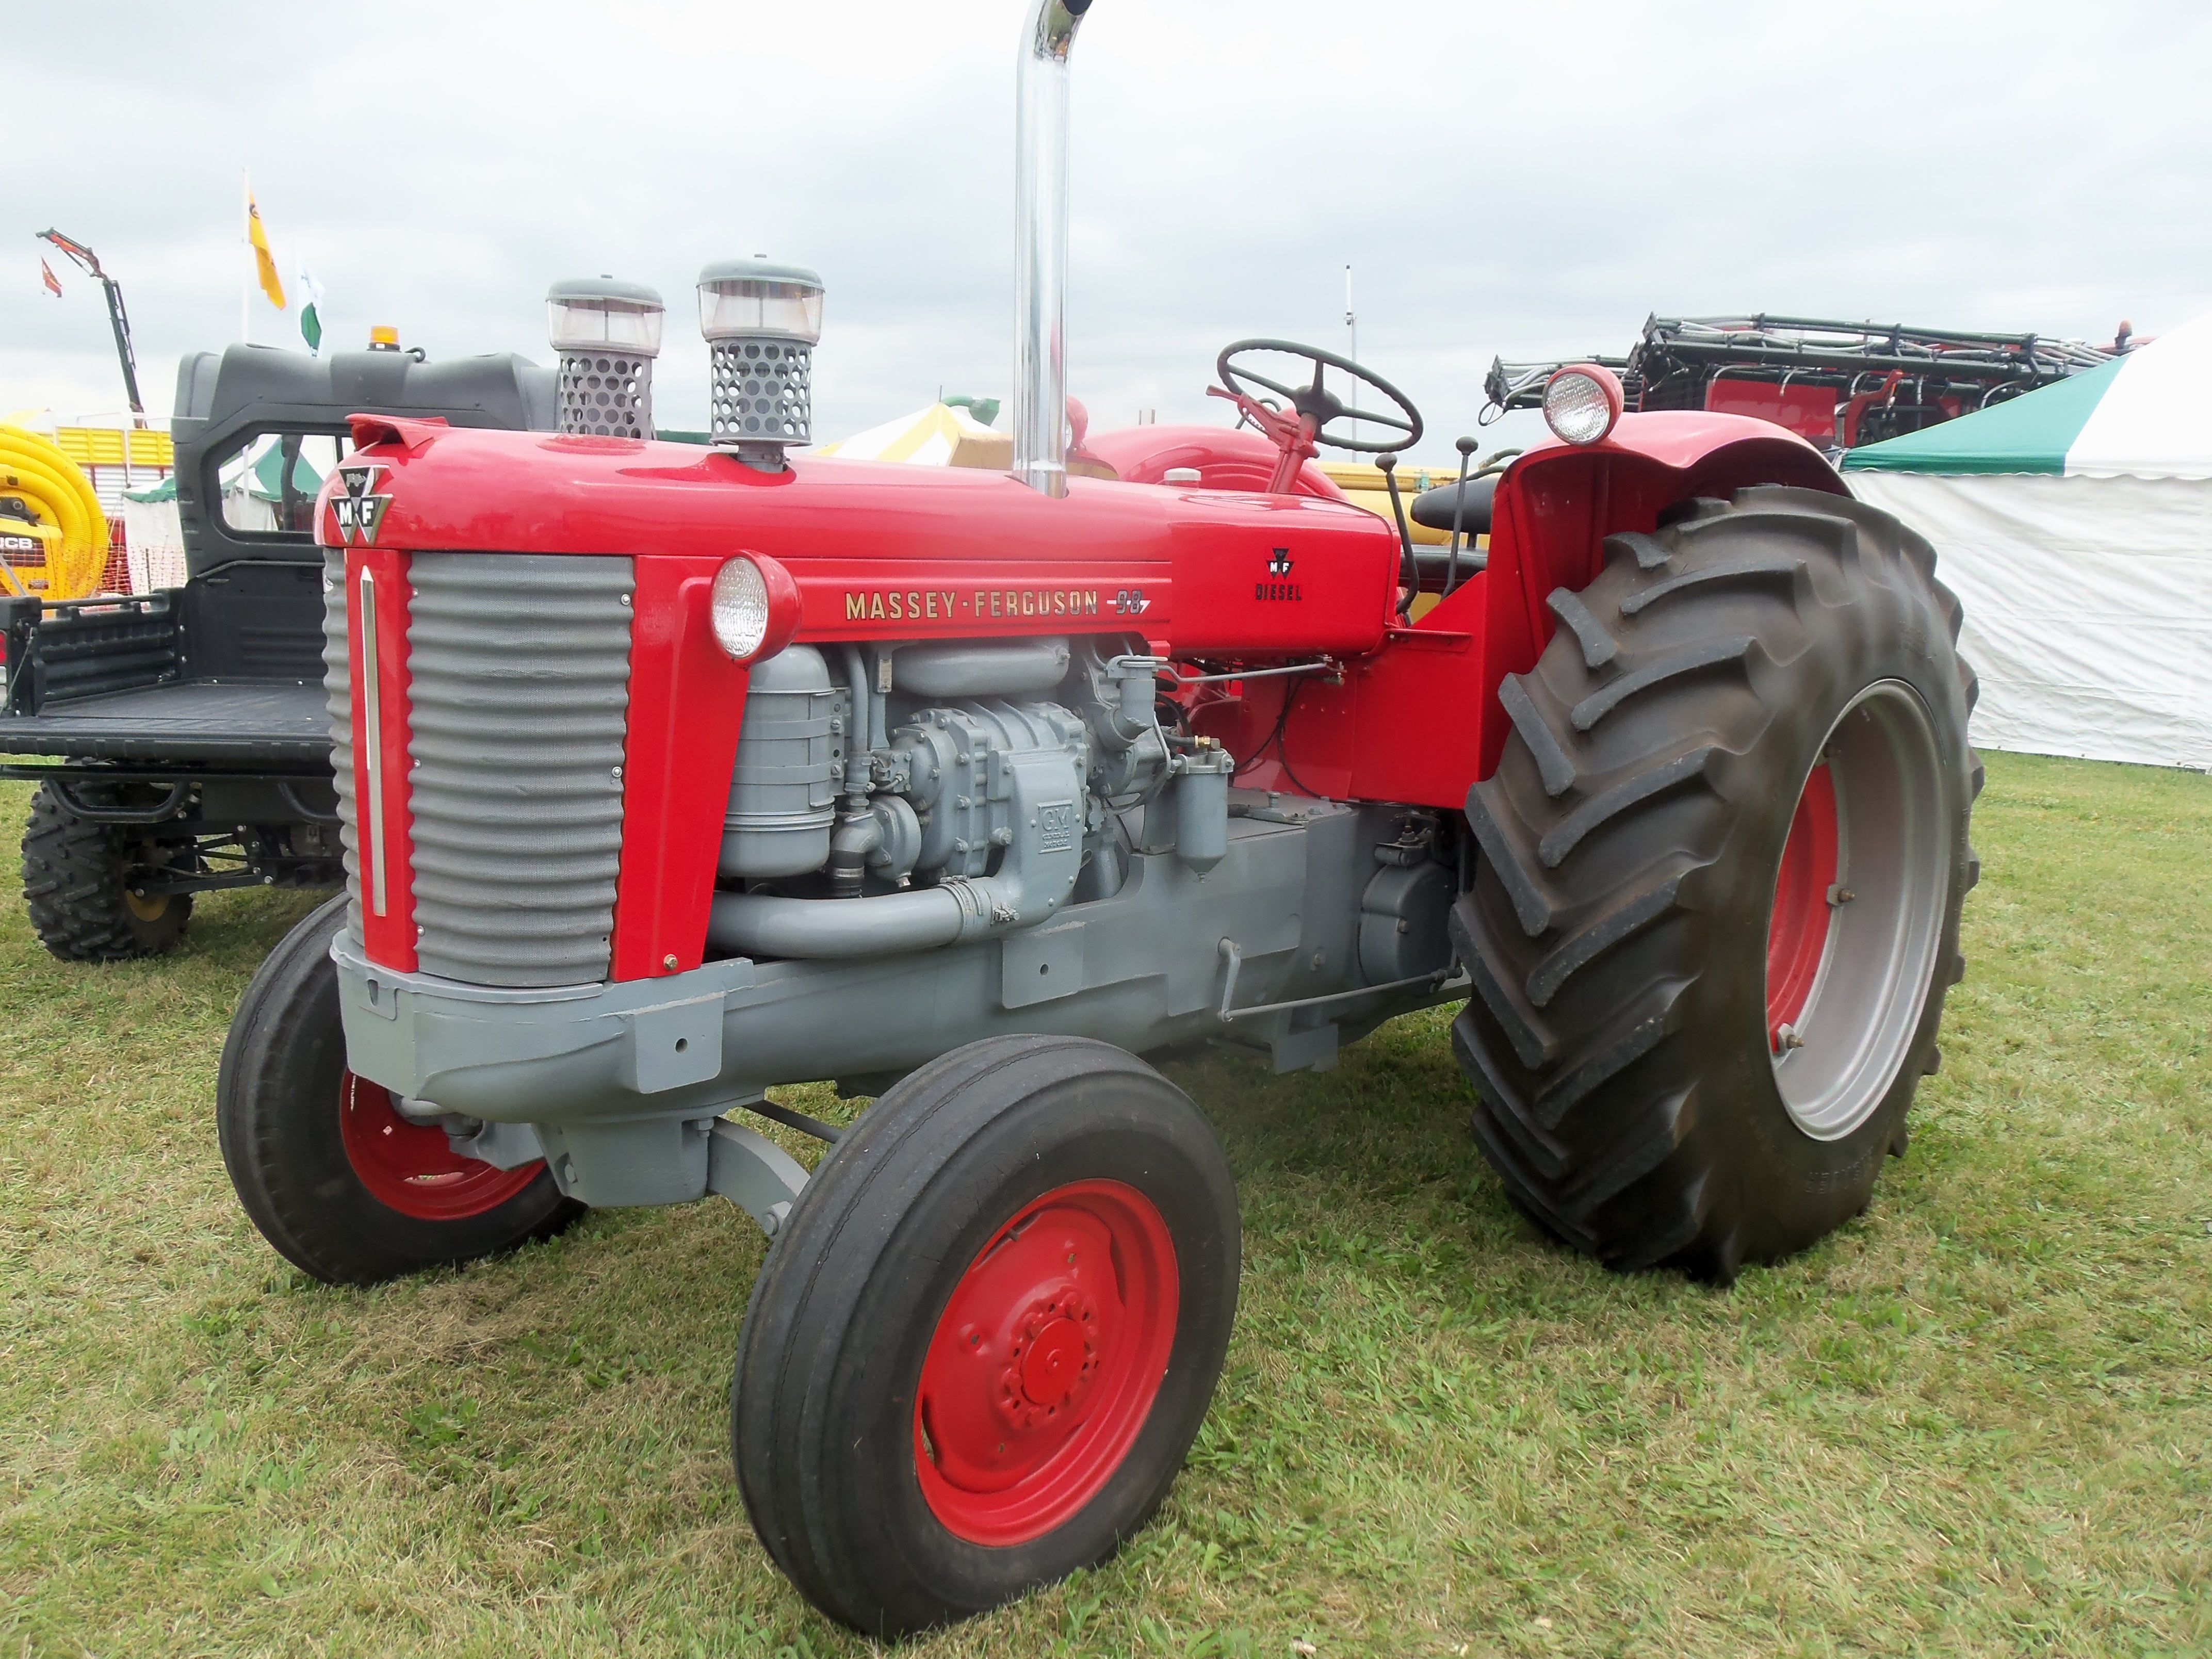 Massey Ferguson Detroit Diesel powered 98 tractor